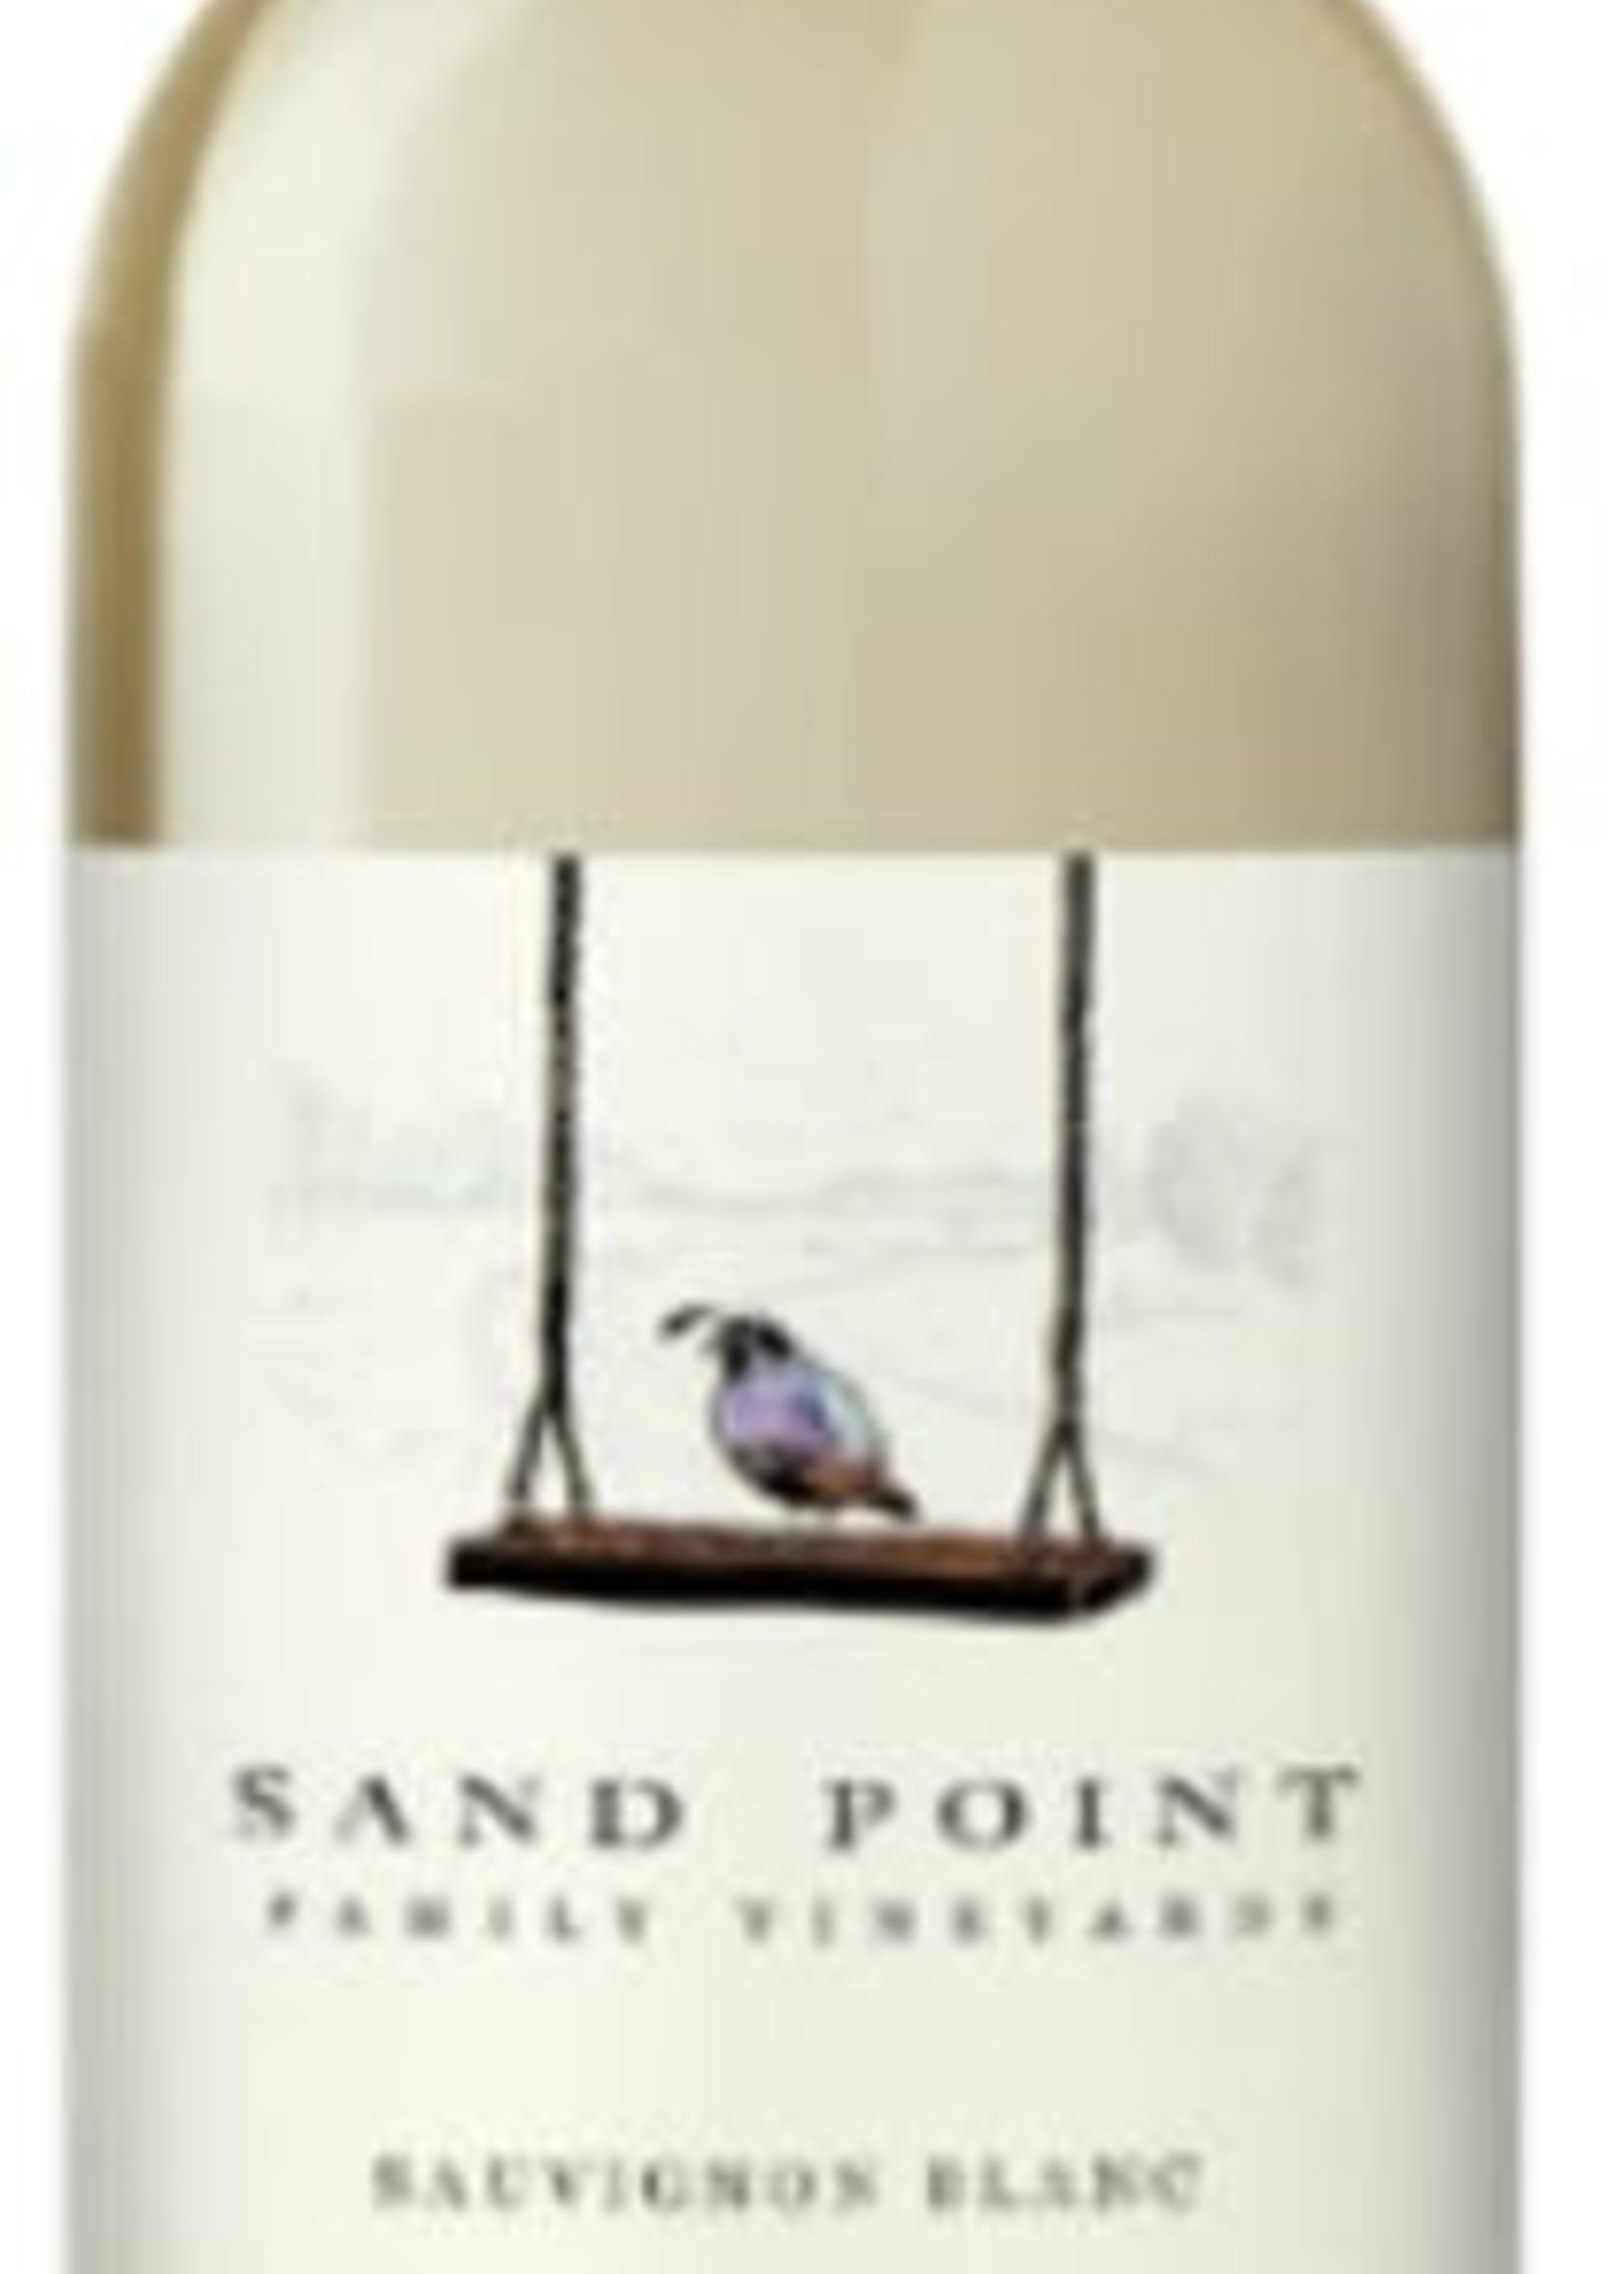 Sand Point Sauvignon Blanc